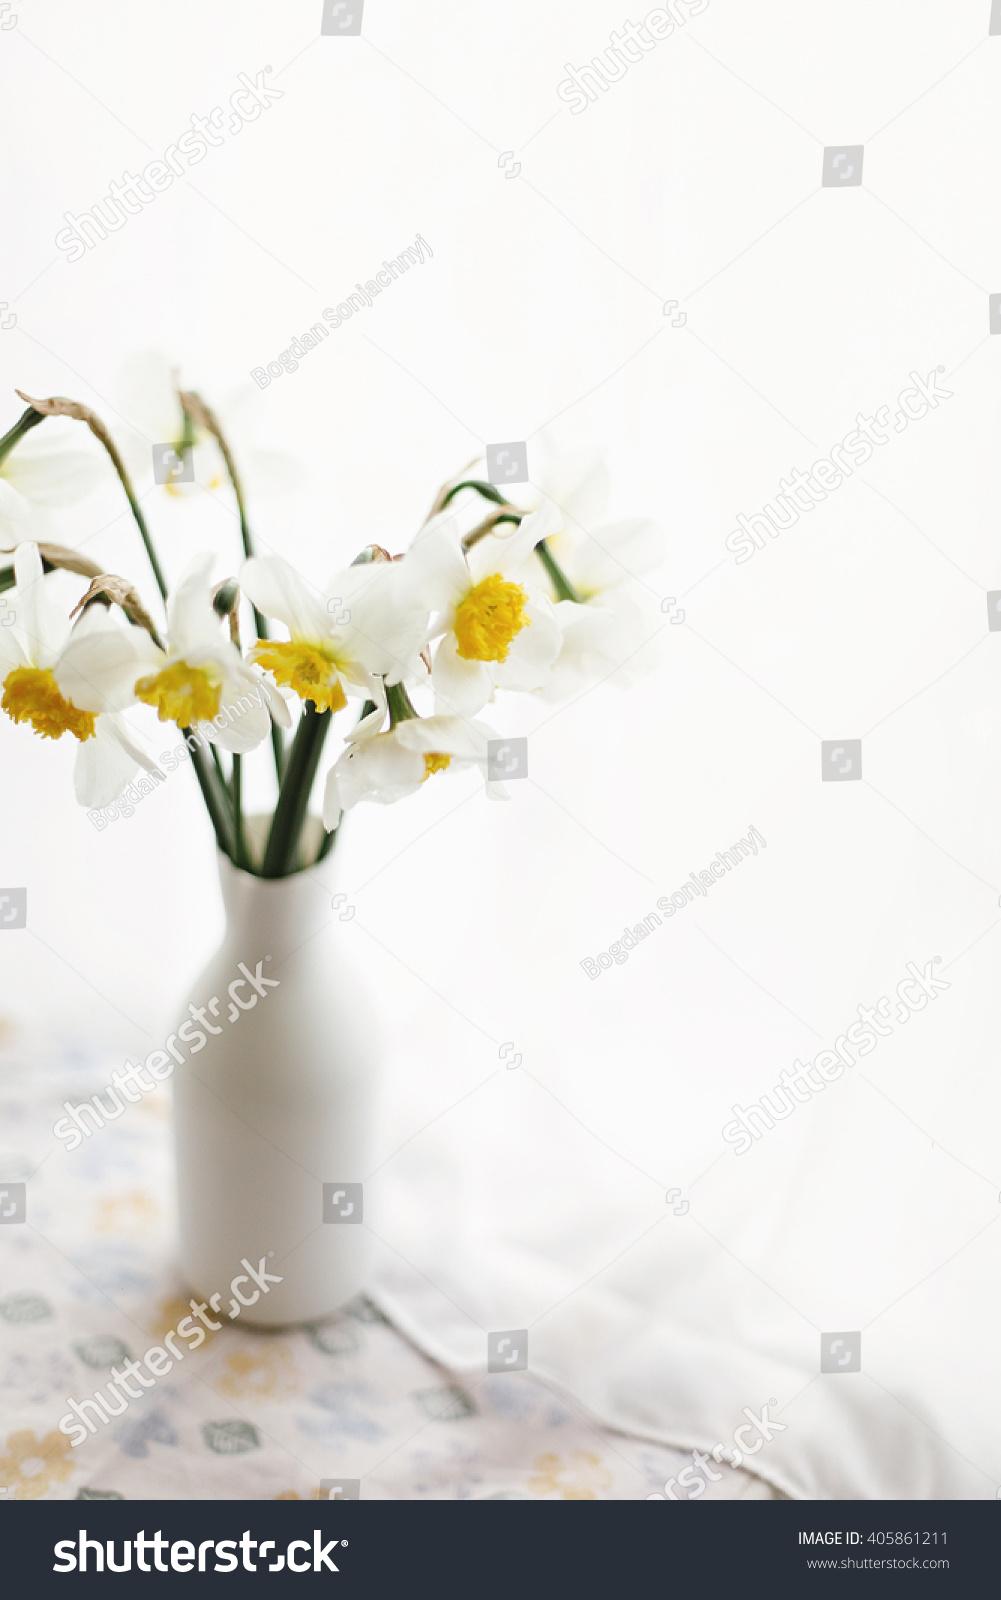 Beautiful amazing yellow daffodils modern white stock photo beautiful amazing yellow daffodils in modern white vase on background of morning light from window reviewsmspy